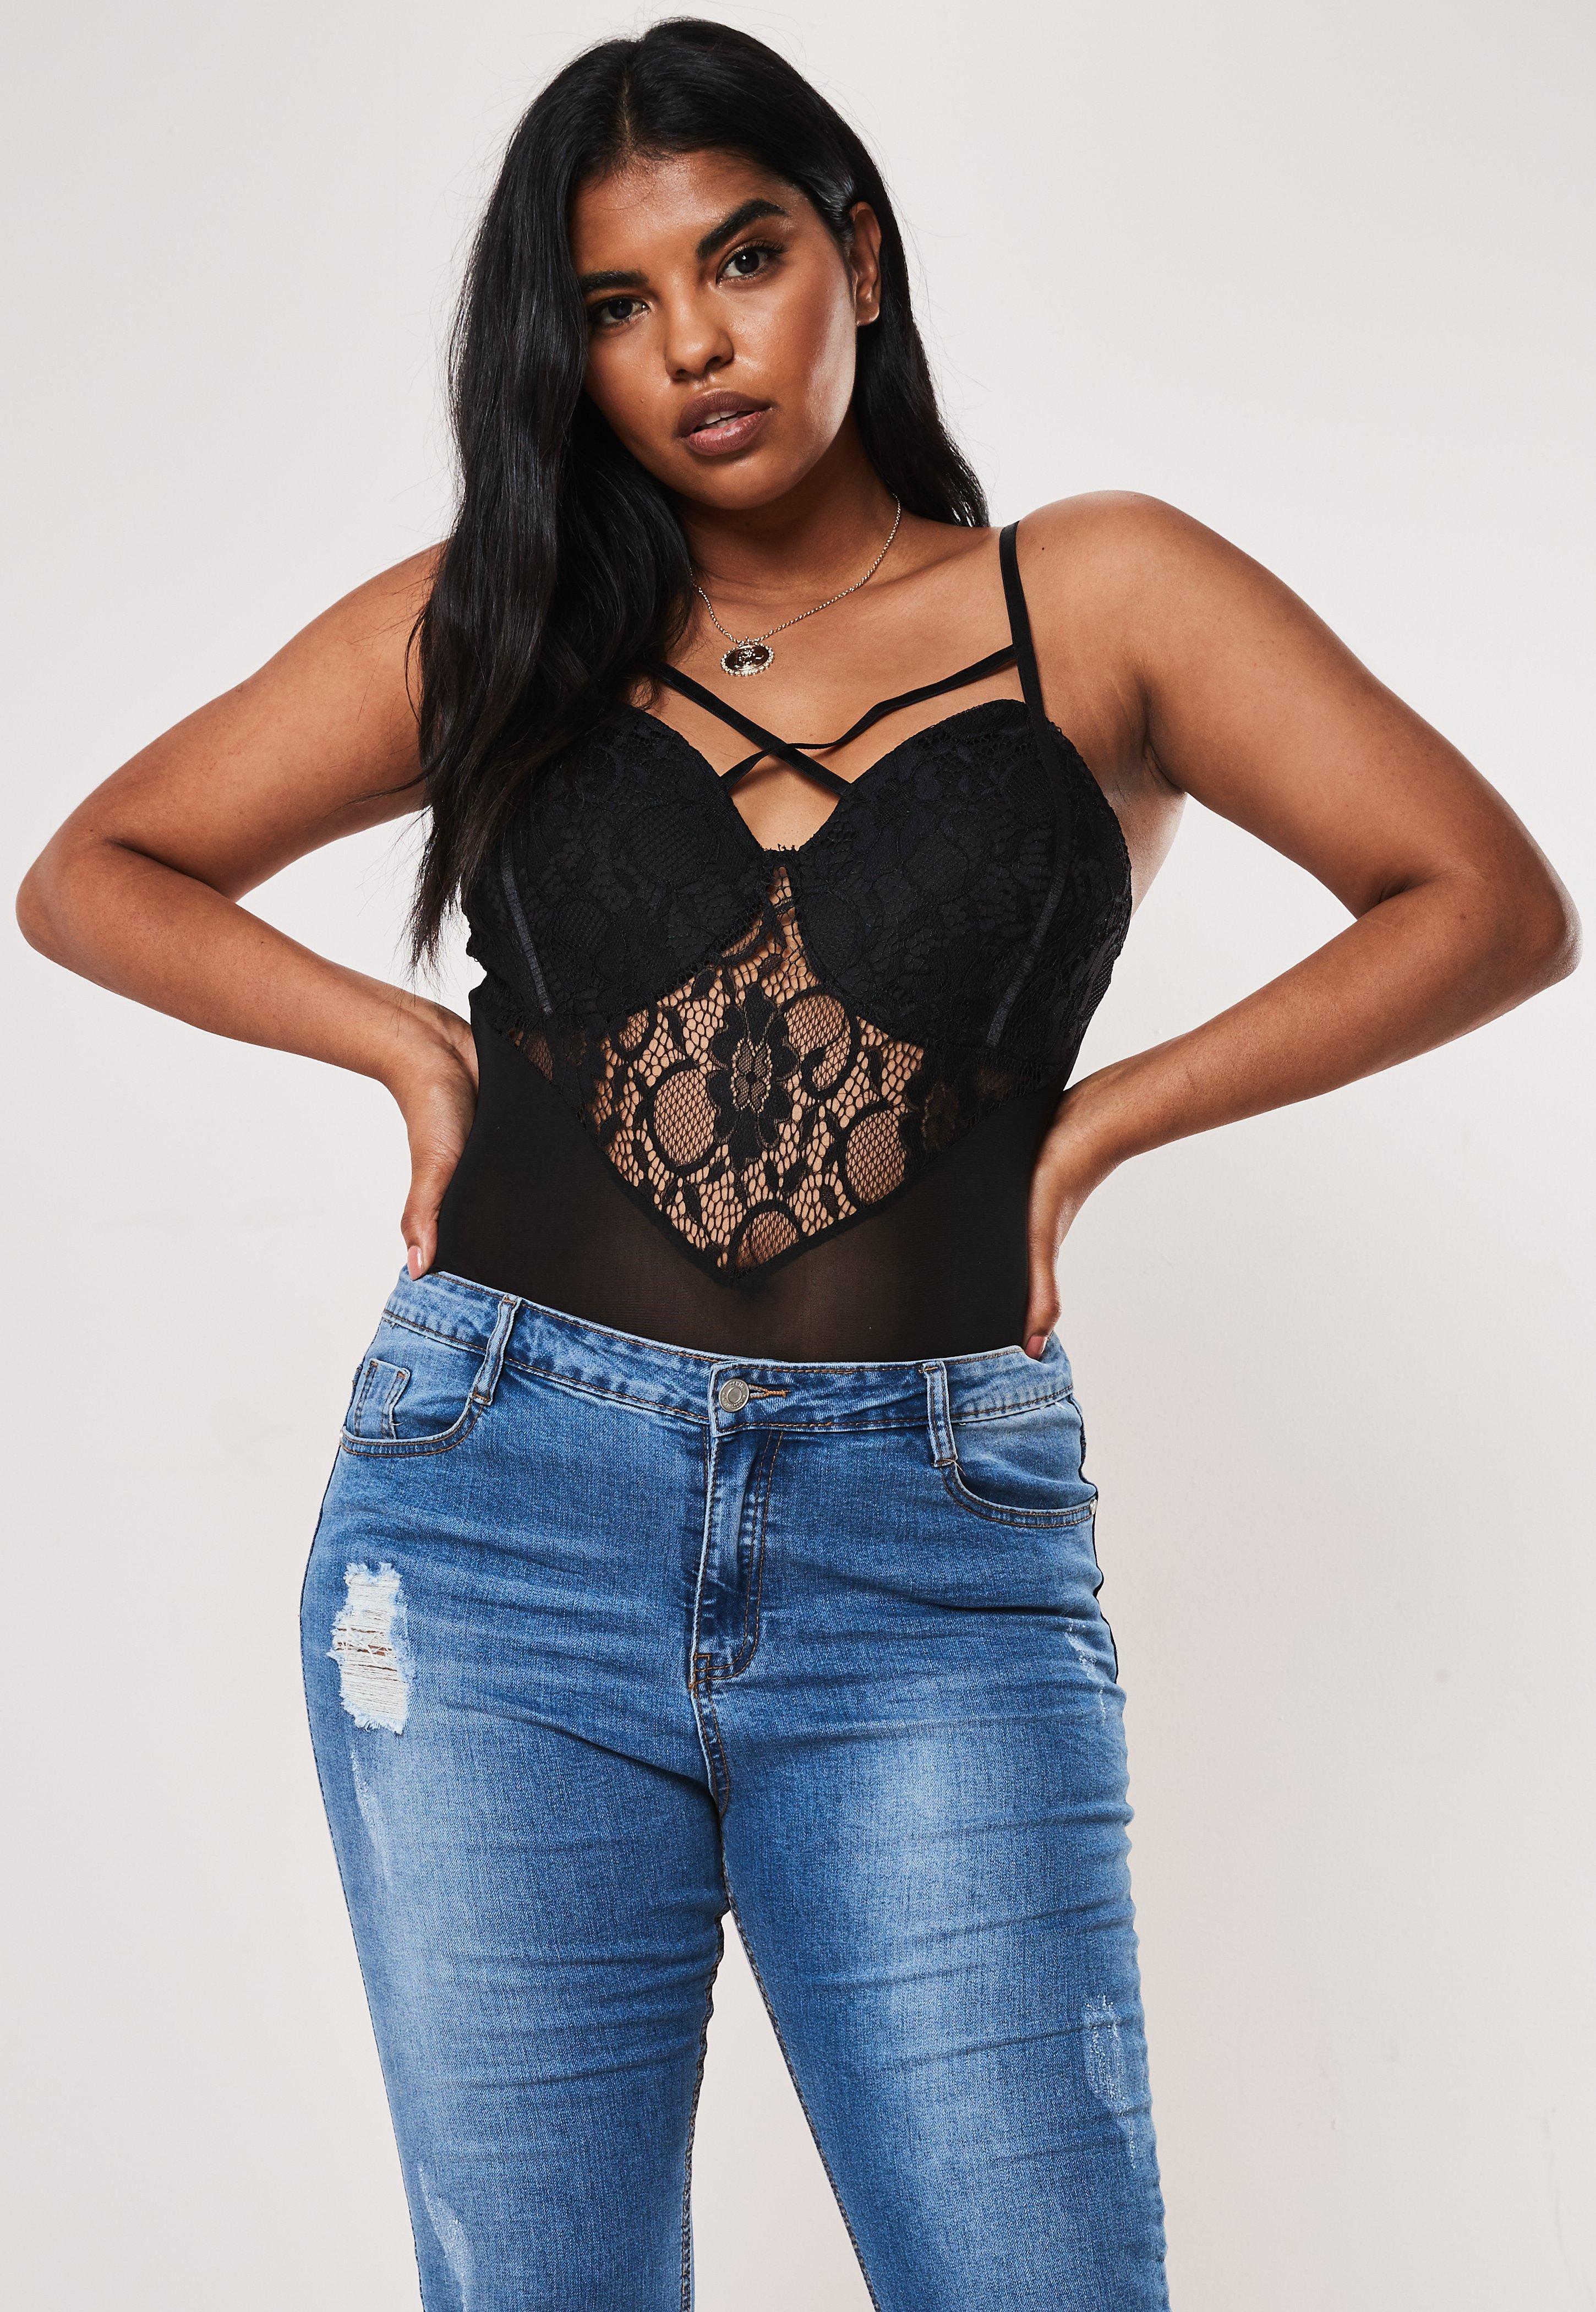 928725abb03 Plus Size Clothing & Plus Size Women's Fashion | Missguided+